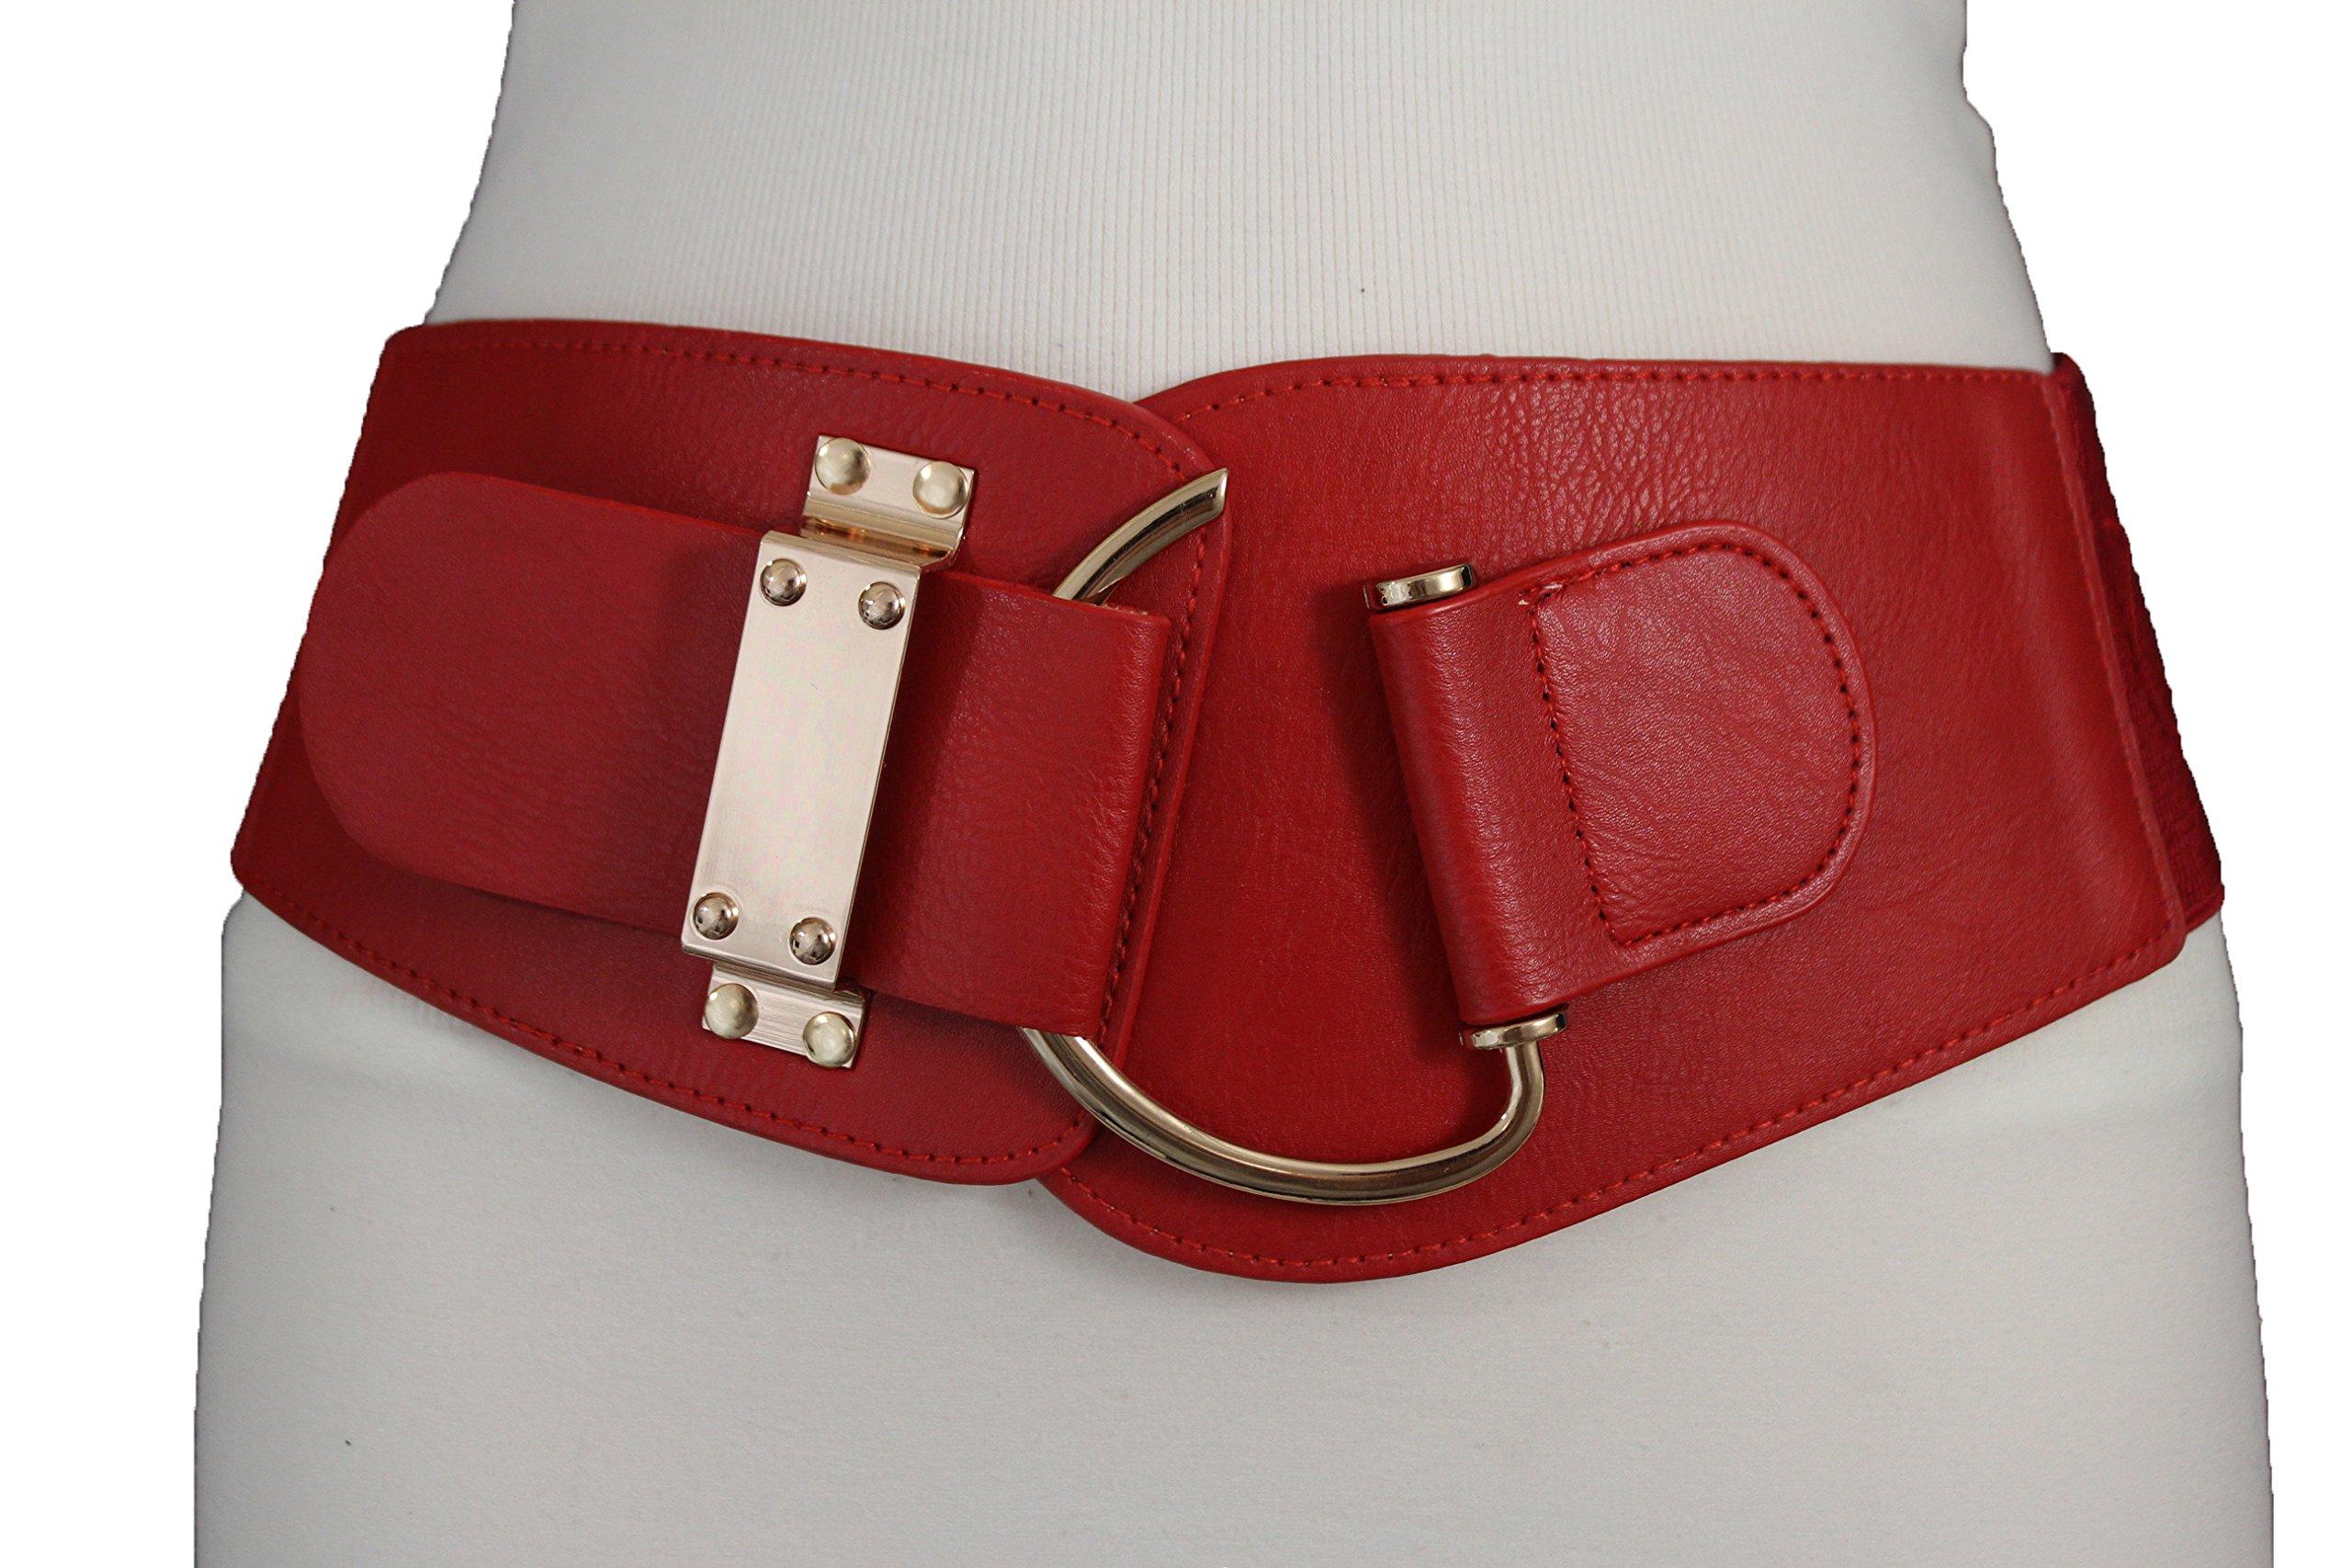 TFJ New Women's Wide Fashion Belt Hip High Waist Gold Metal Hook Buckle Plus M L Xl (Red)